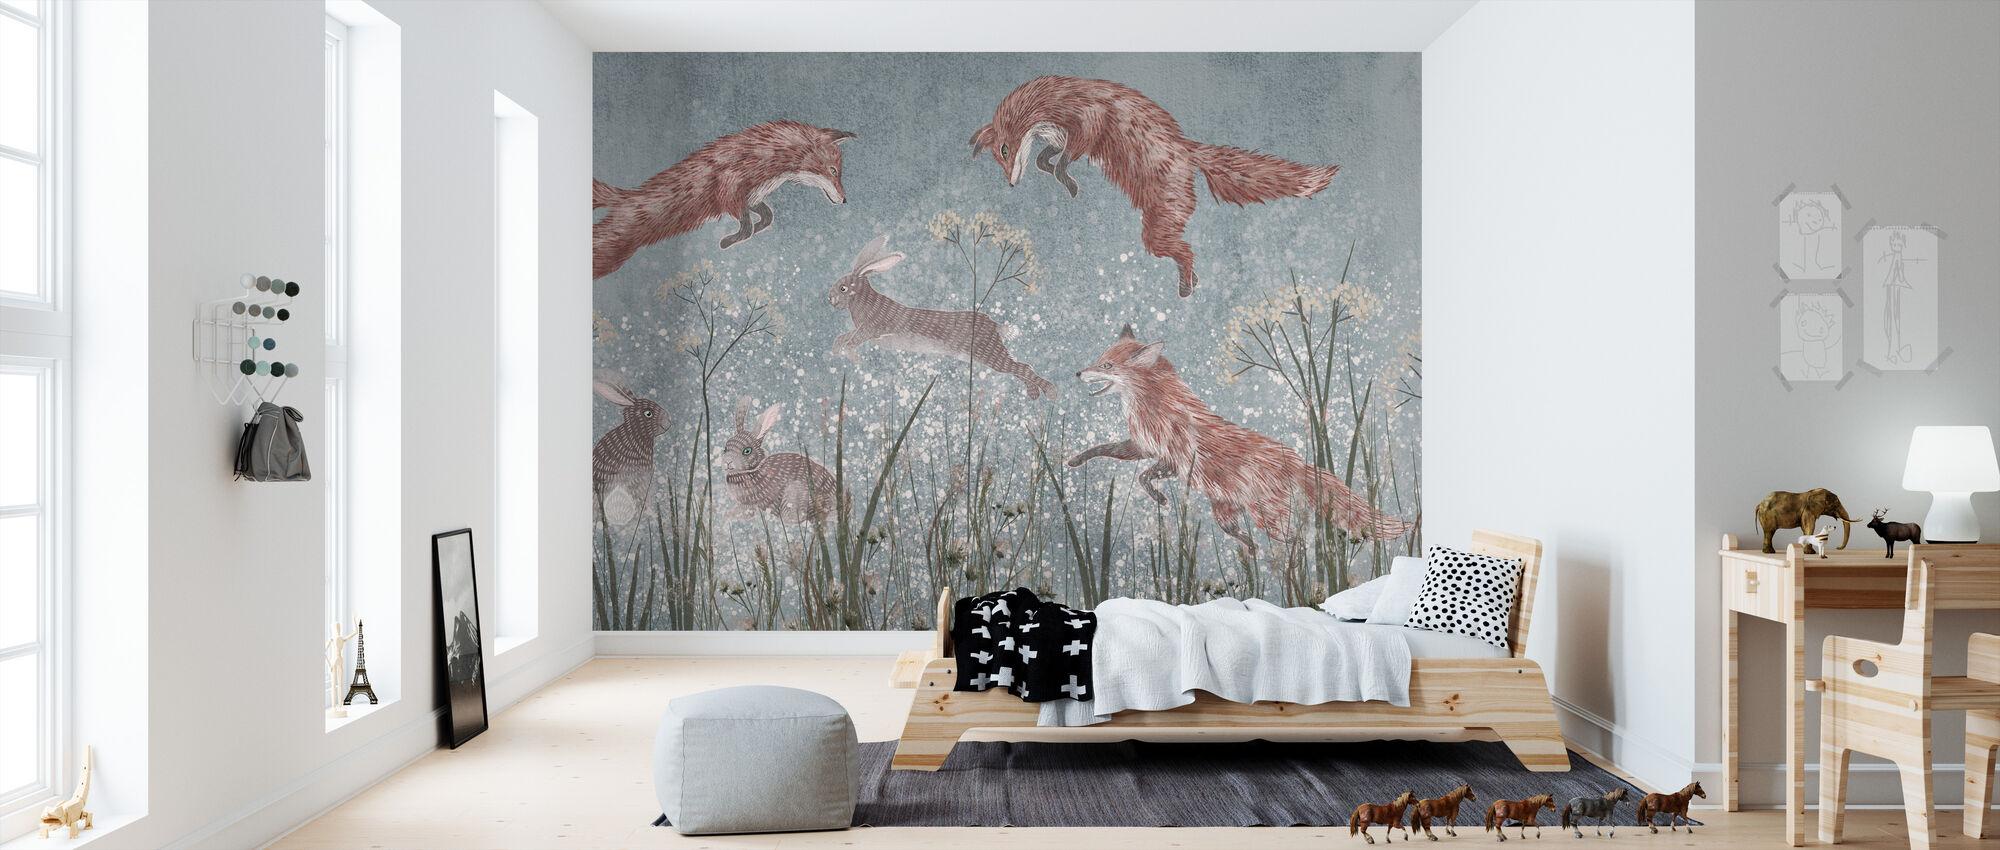 Jumping Foxes III - Wallpaper - Kids Room